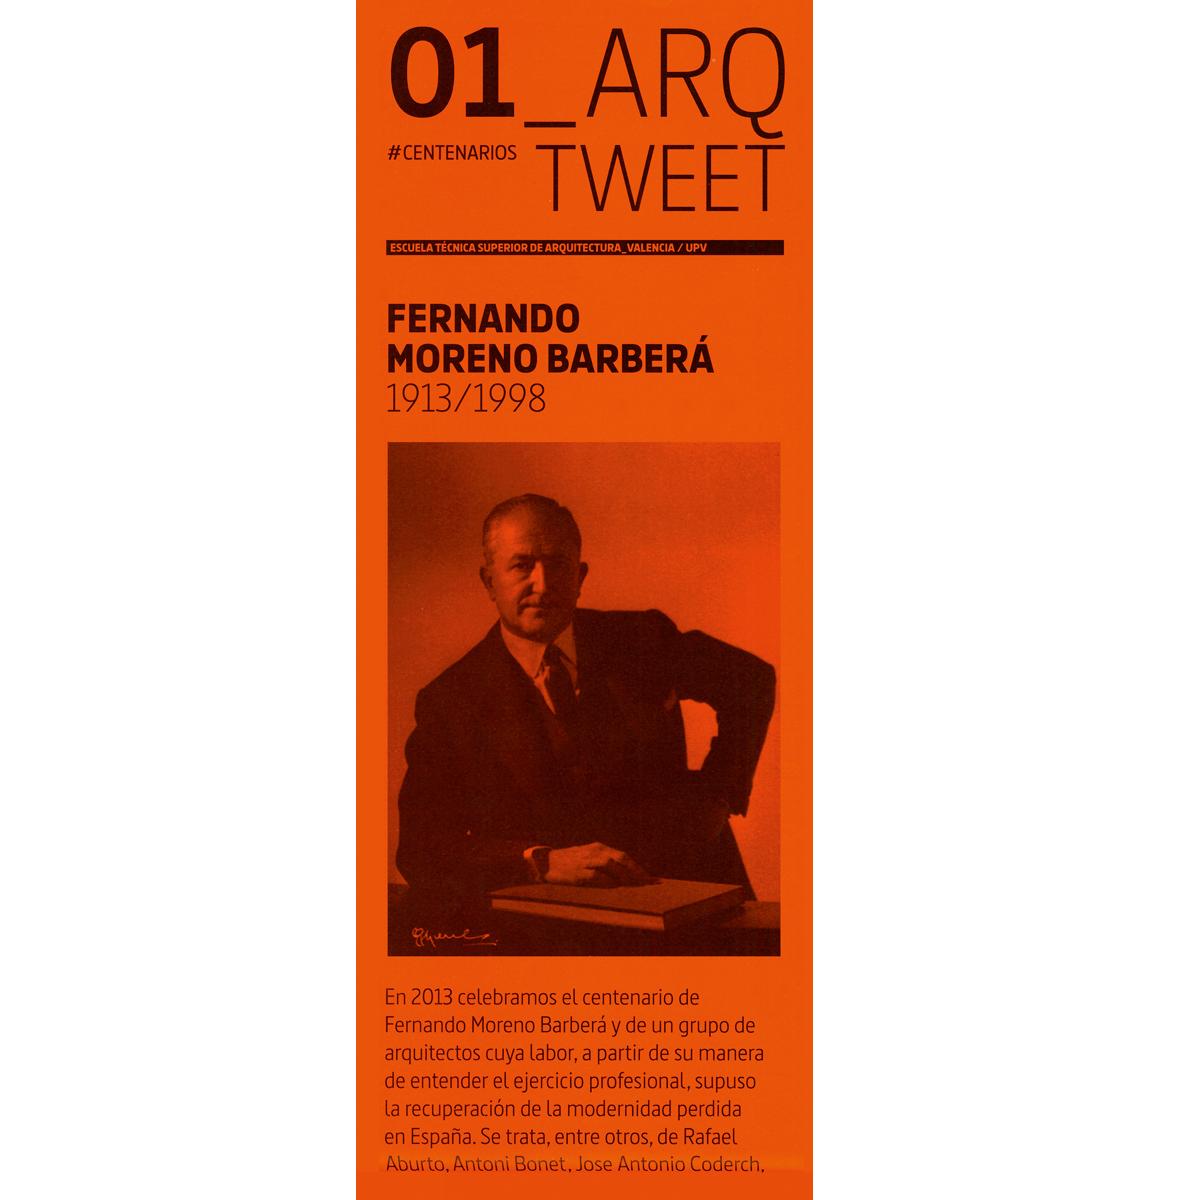 Arq Tweet: Fernando Moreno Barberá